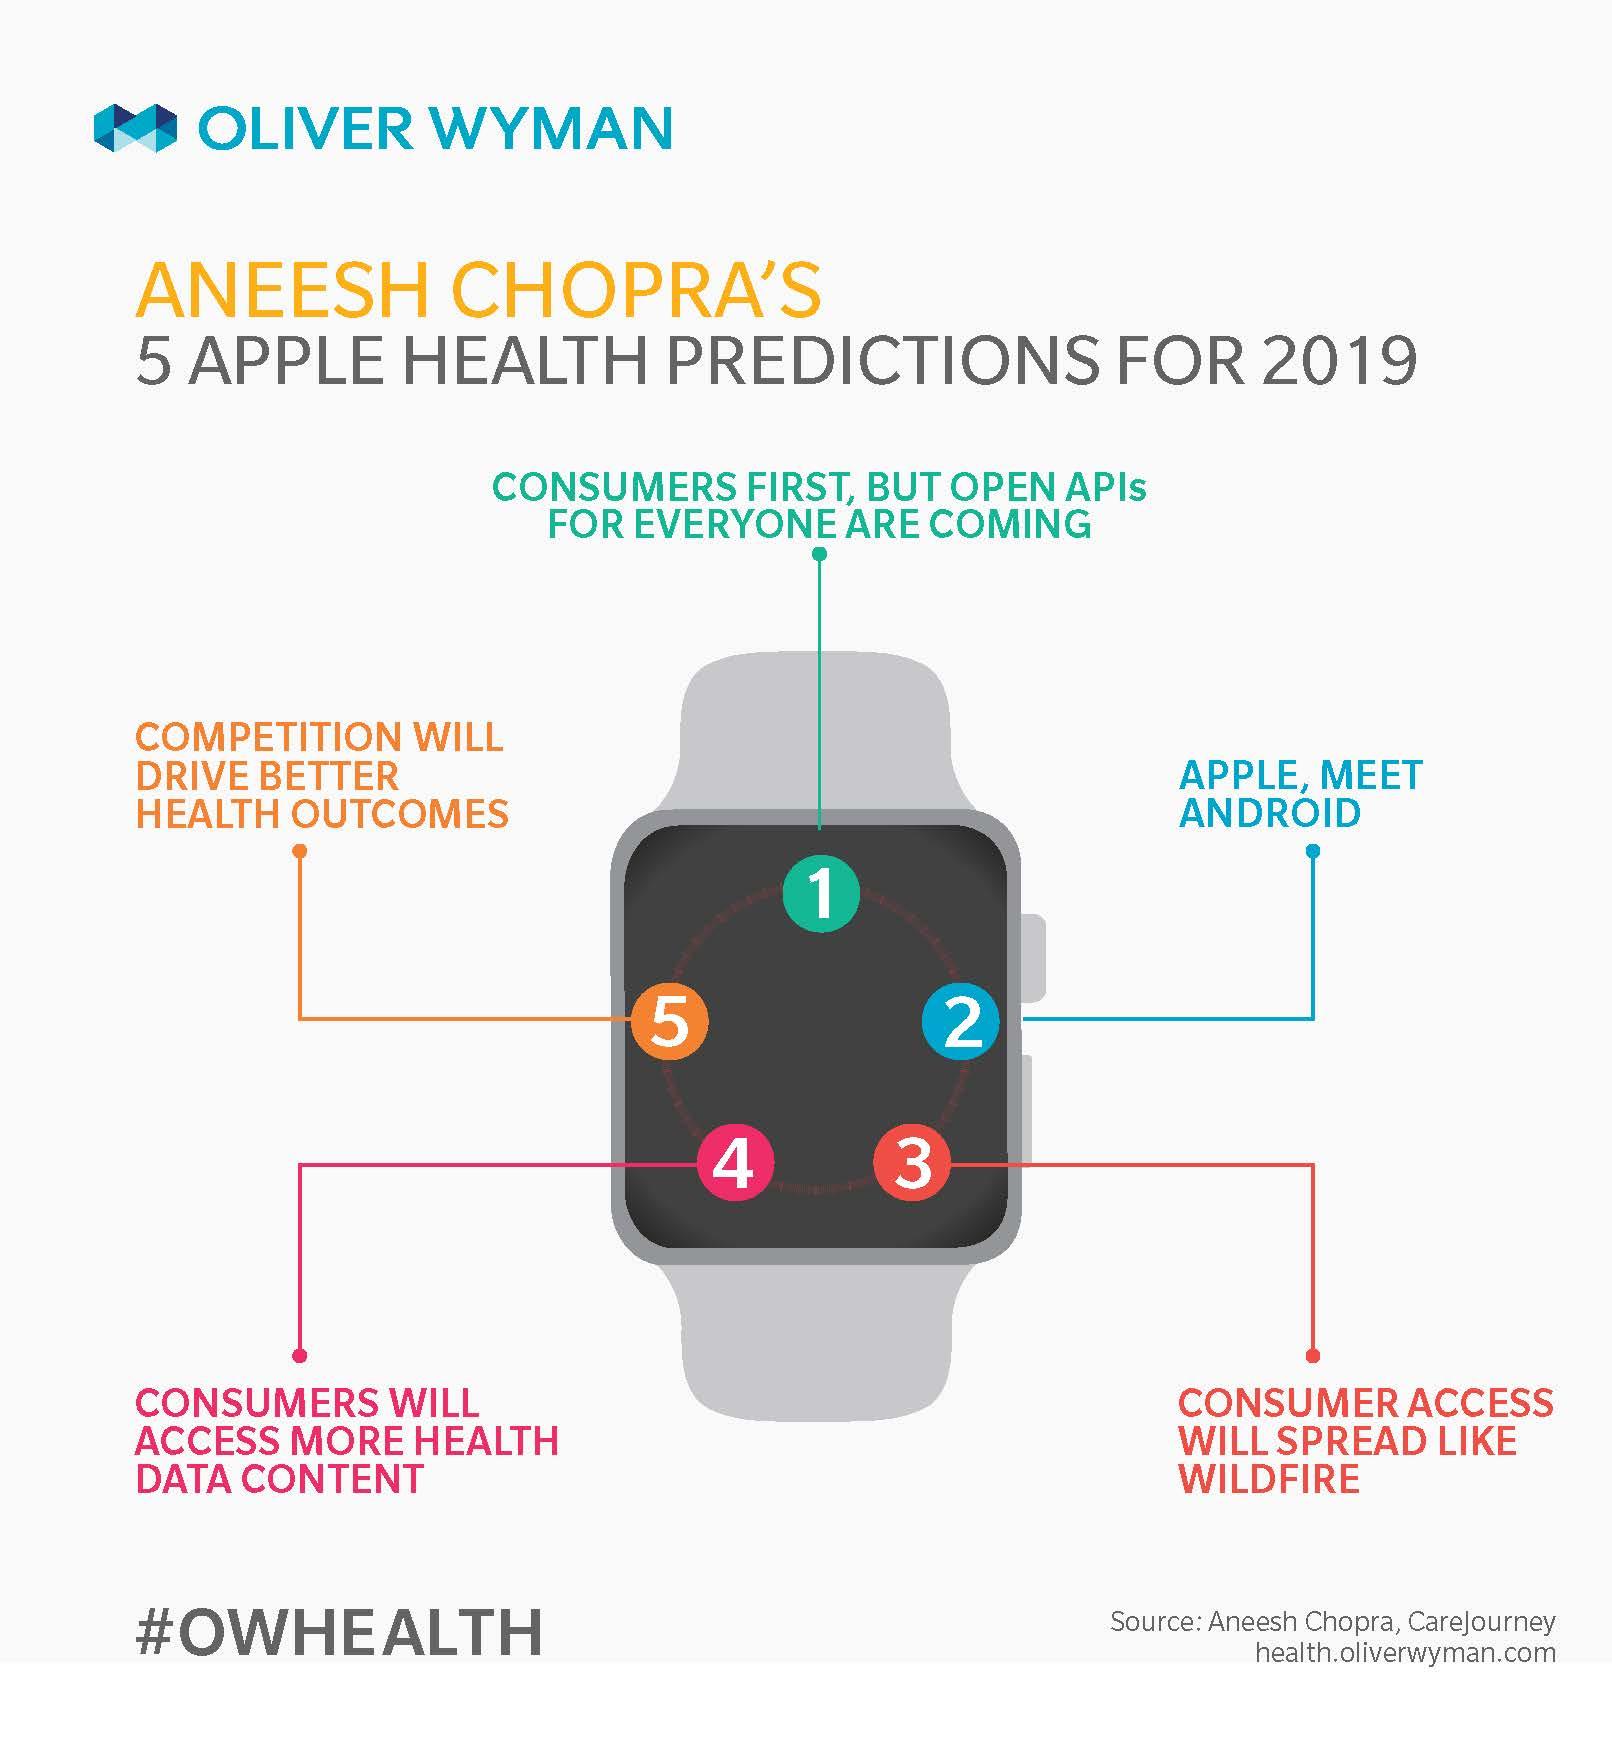 Aneesh Chopra's Five Consumer Health API Predictions For 2019